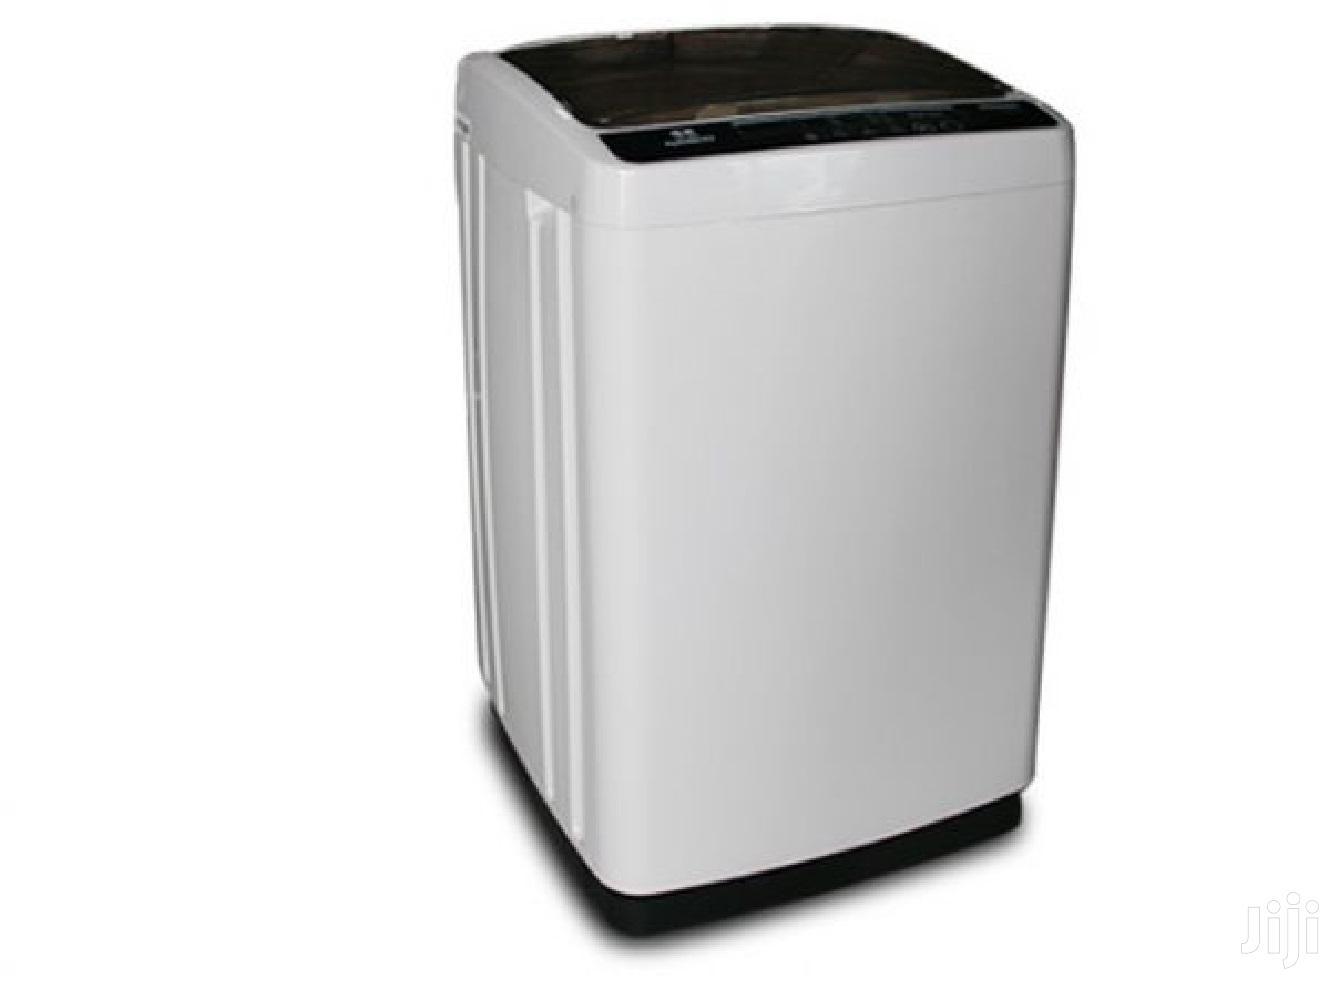 6kg Nasco Top Load Washing Machine White